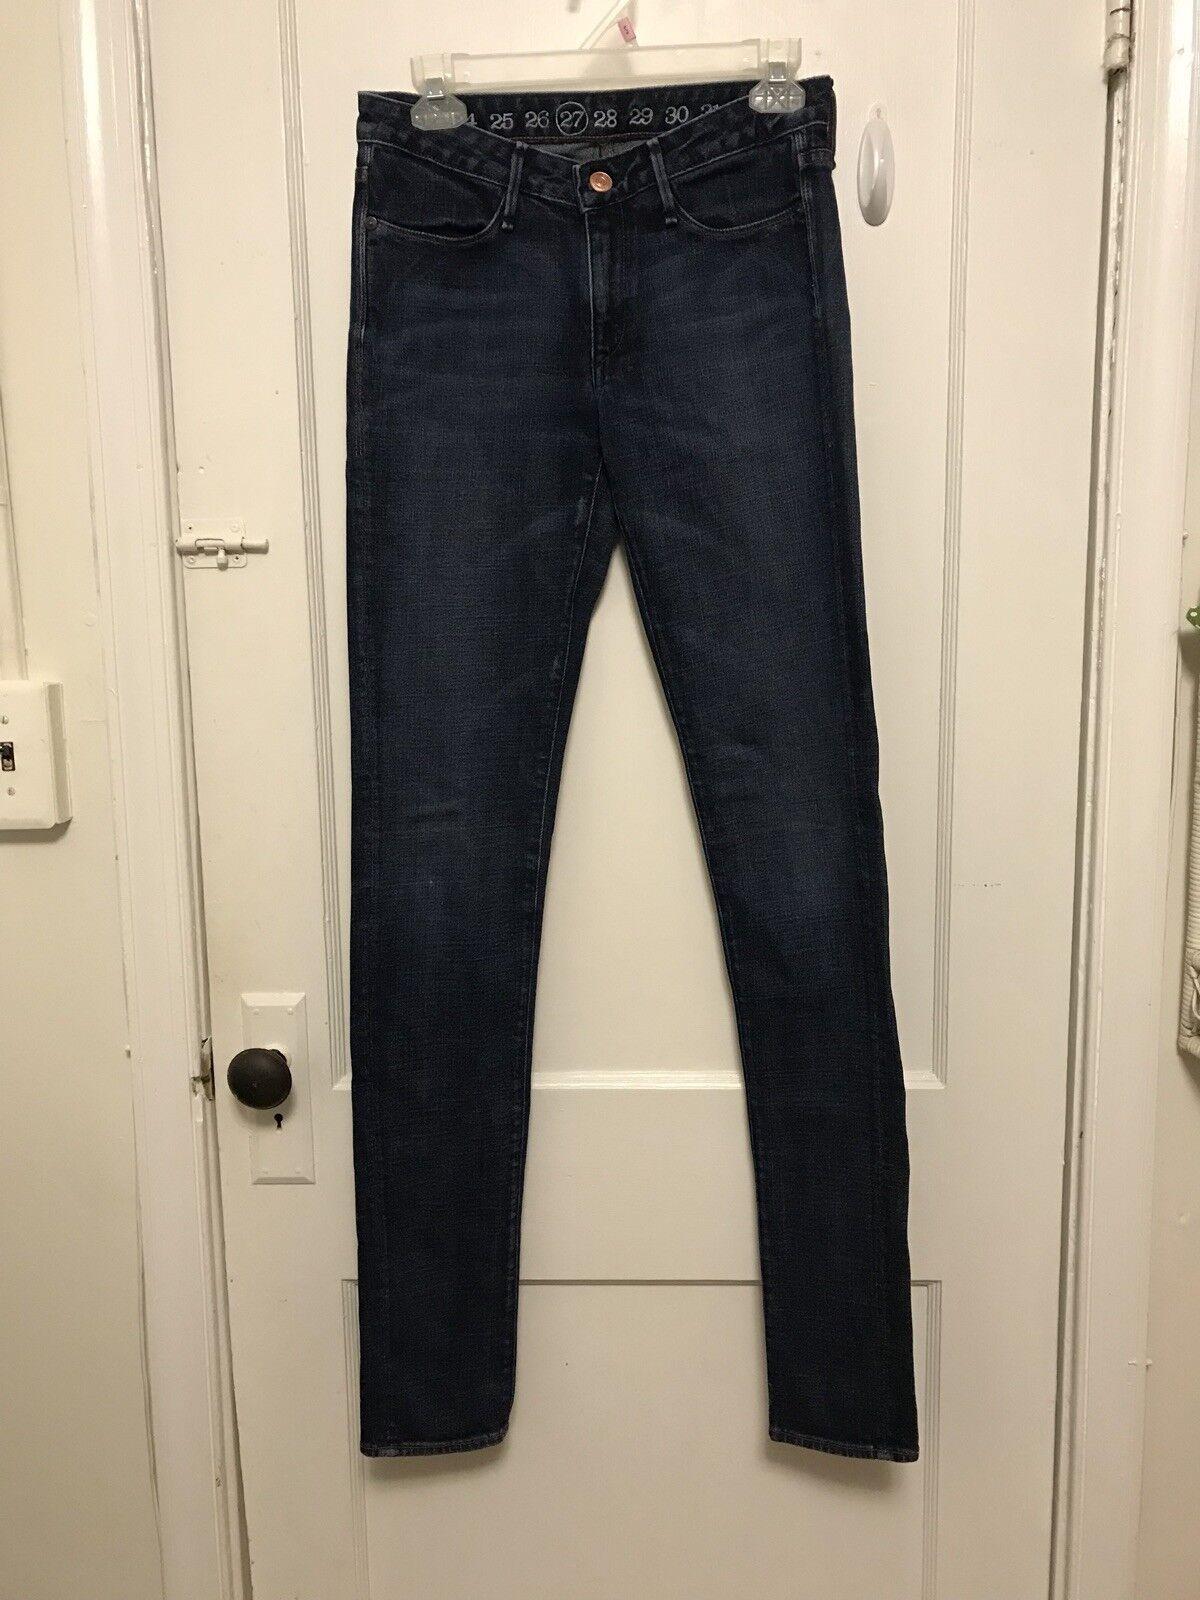 Earnest Sewn Dark Wash Ankle Skinny Jeans Denim size 27